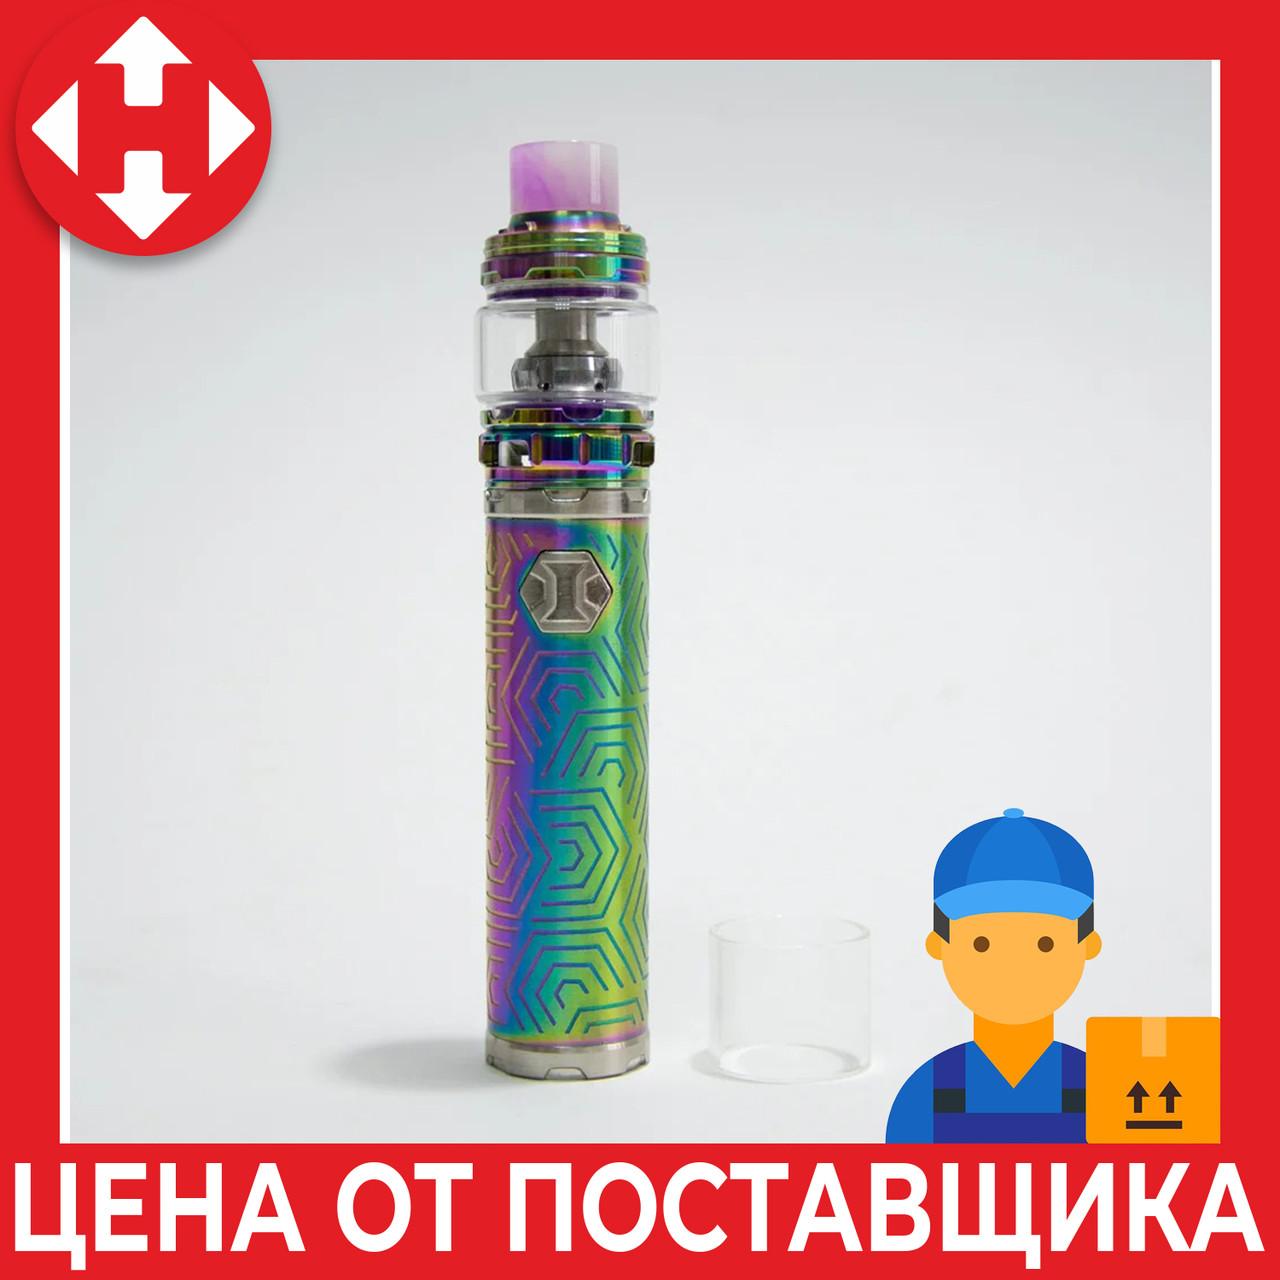 Вейп Eleaf iJust3, 3000 mAh, цвет - Хамелеон, электронная сигарета айджаст 3, электронка